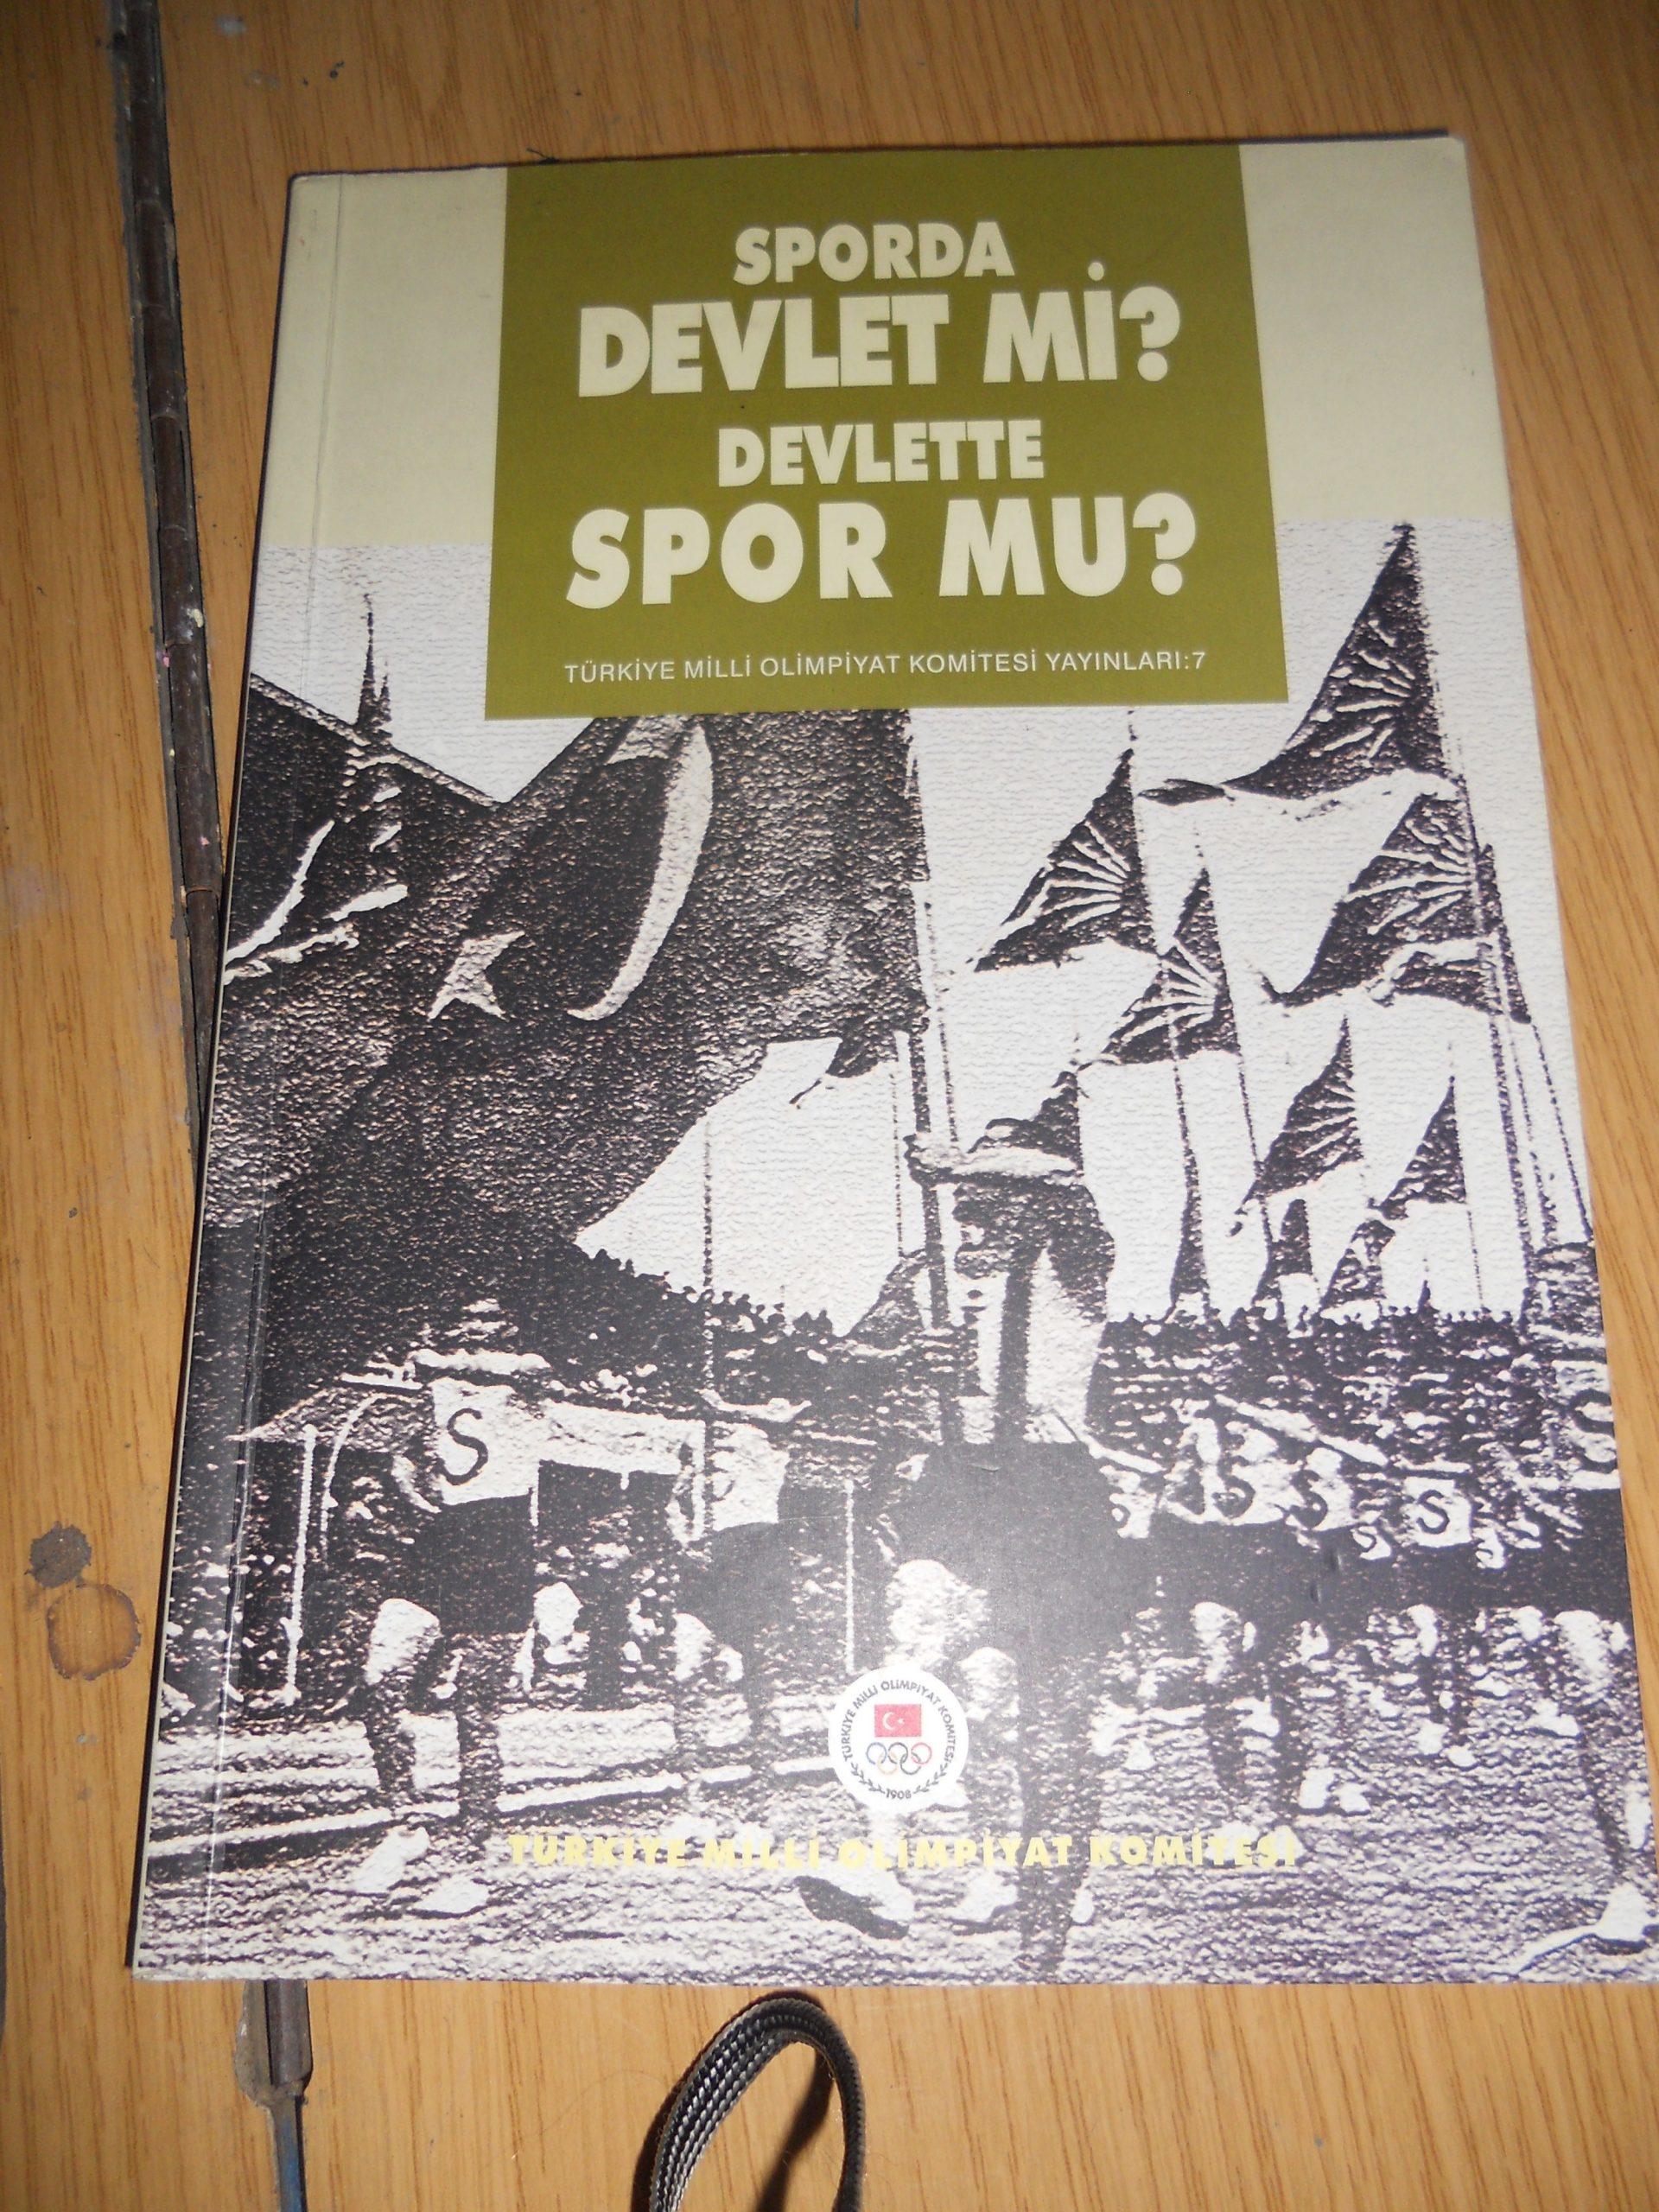 SPORDA DEVLET Mİ,DEVLETTE SPOR MU/Cem Atabeyoğlu/15 TL